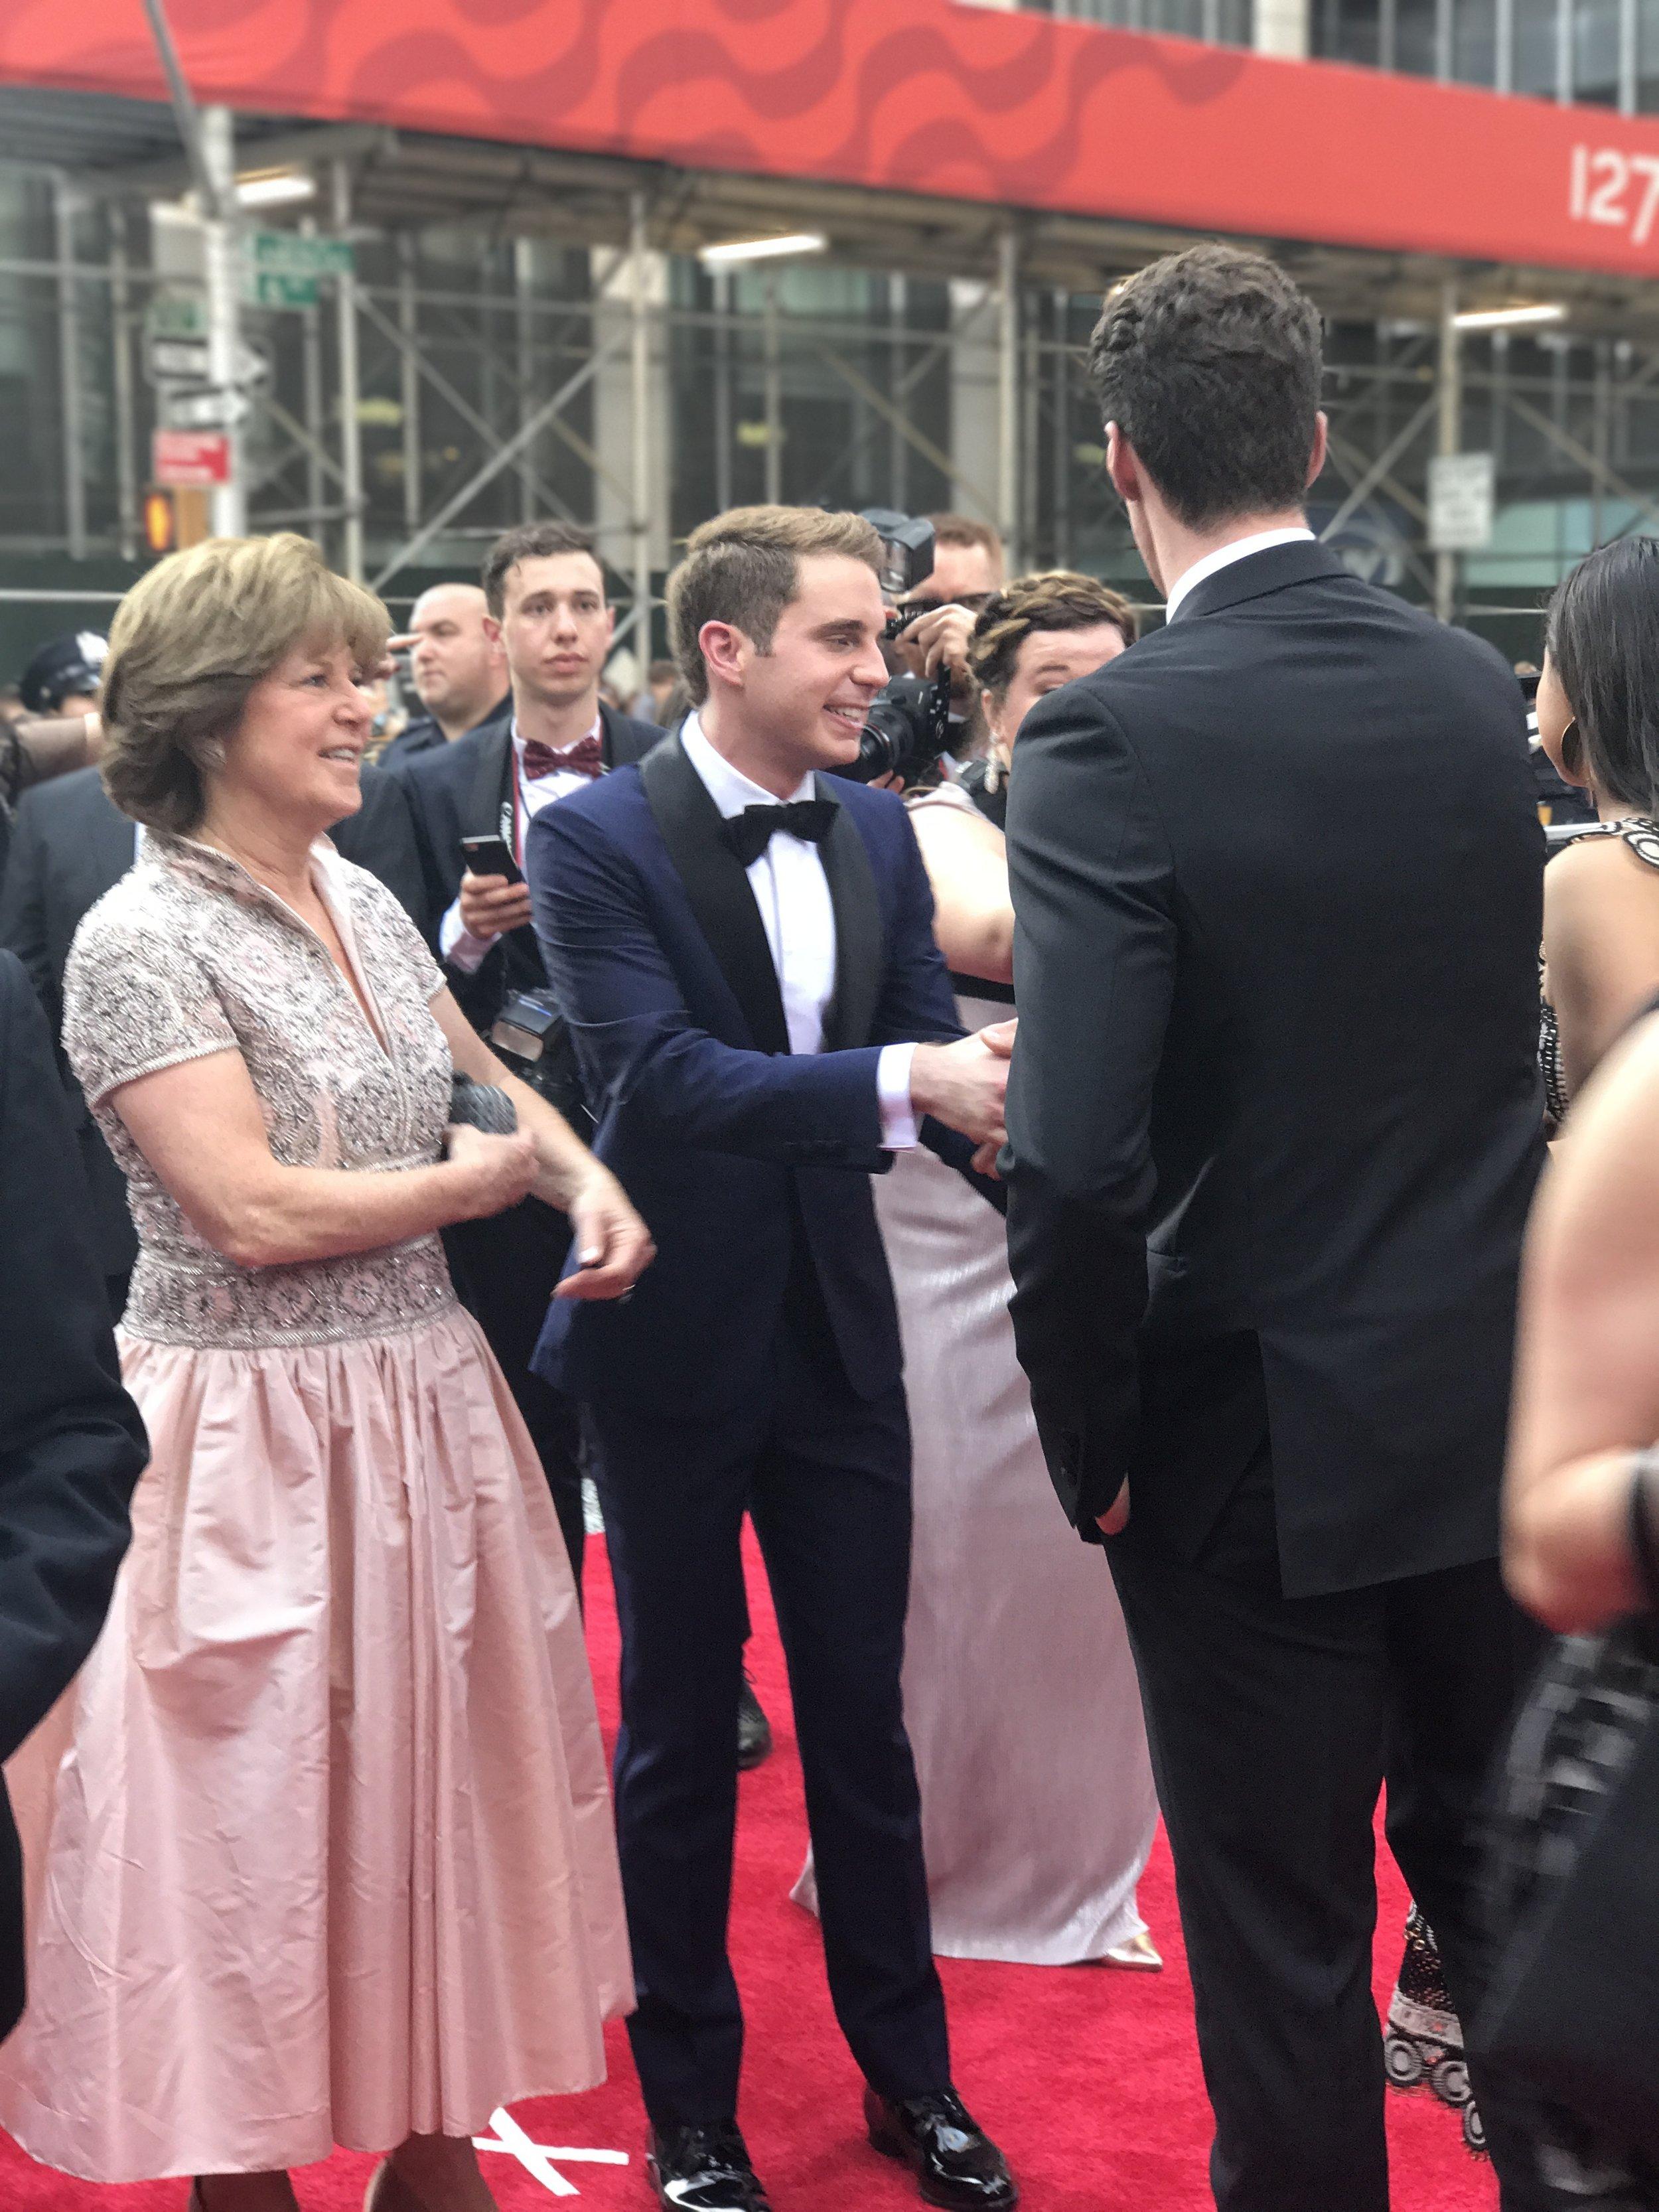 Dear Evan Hansen 's Ben Platt and his mom arrive on the red carpet.